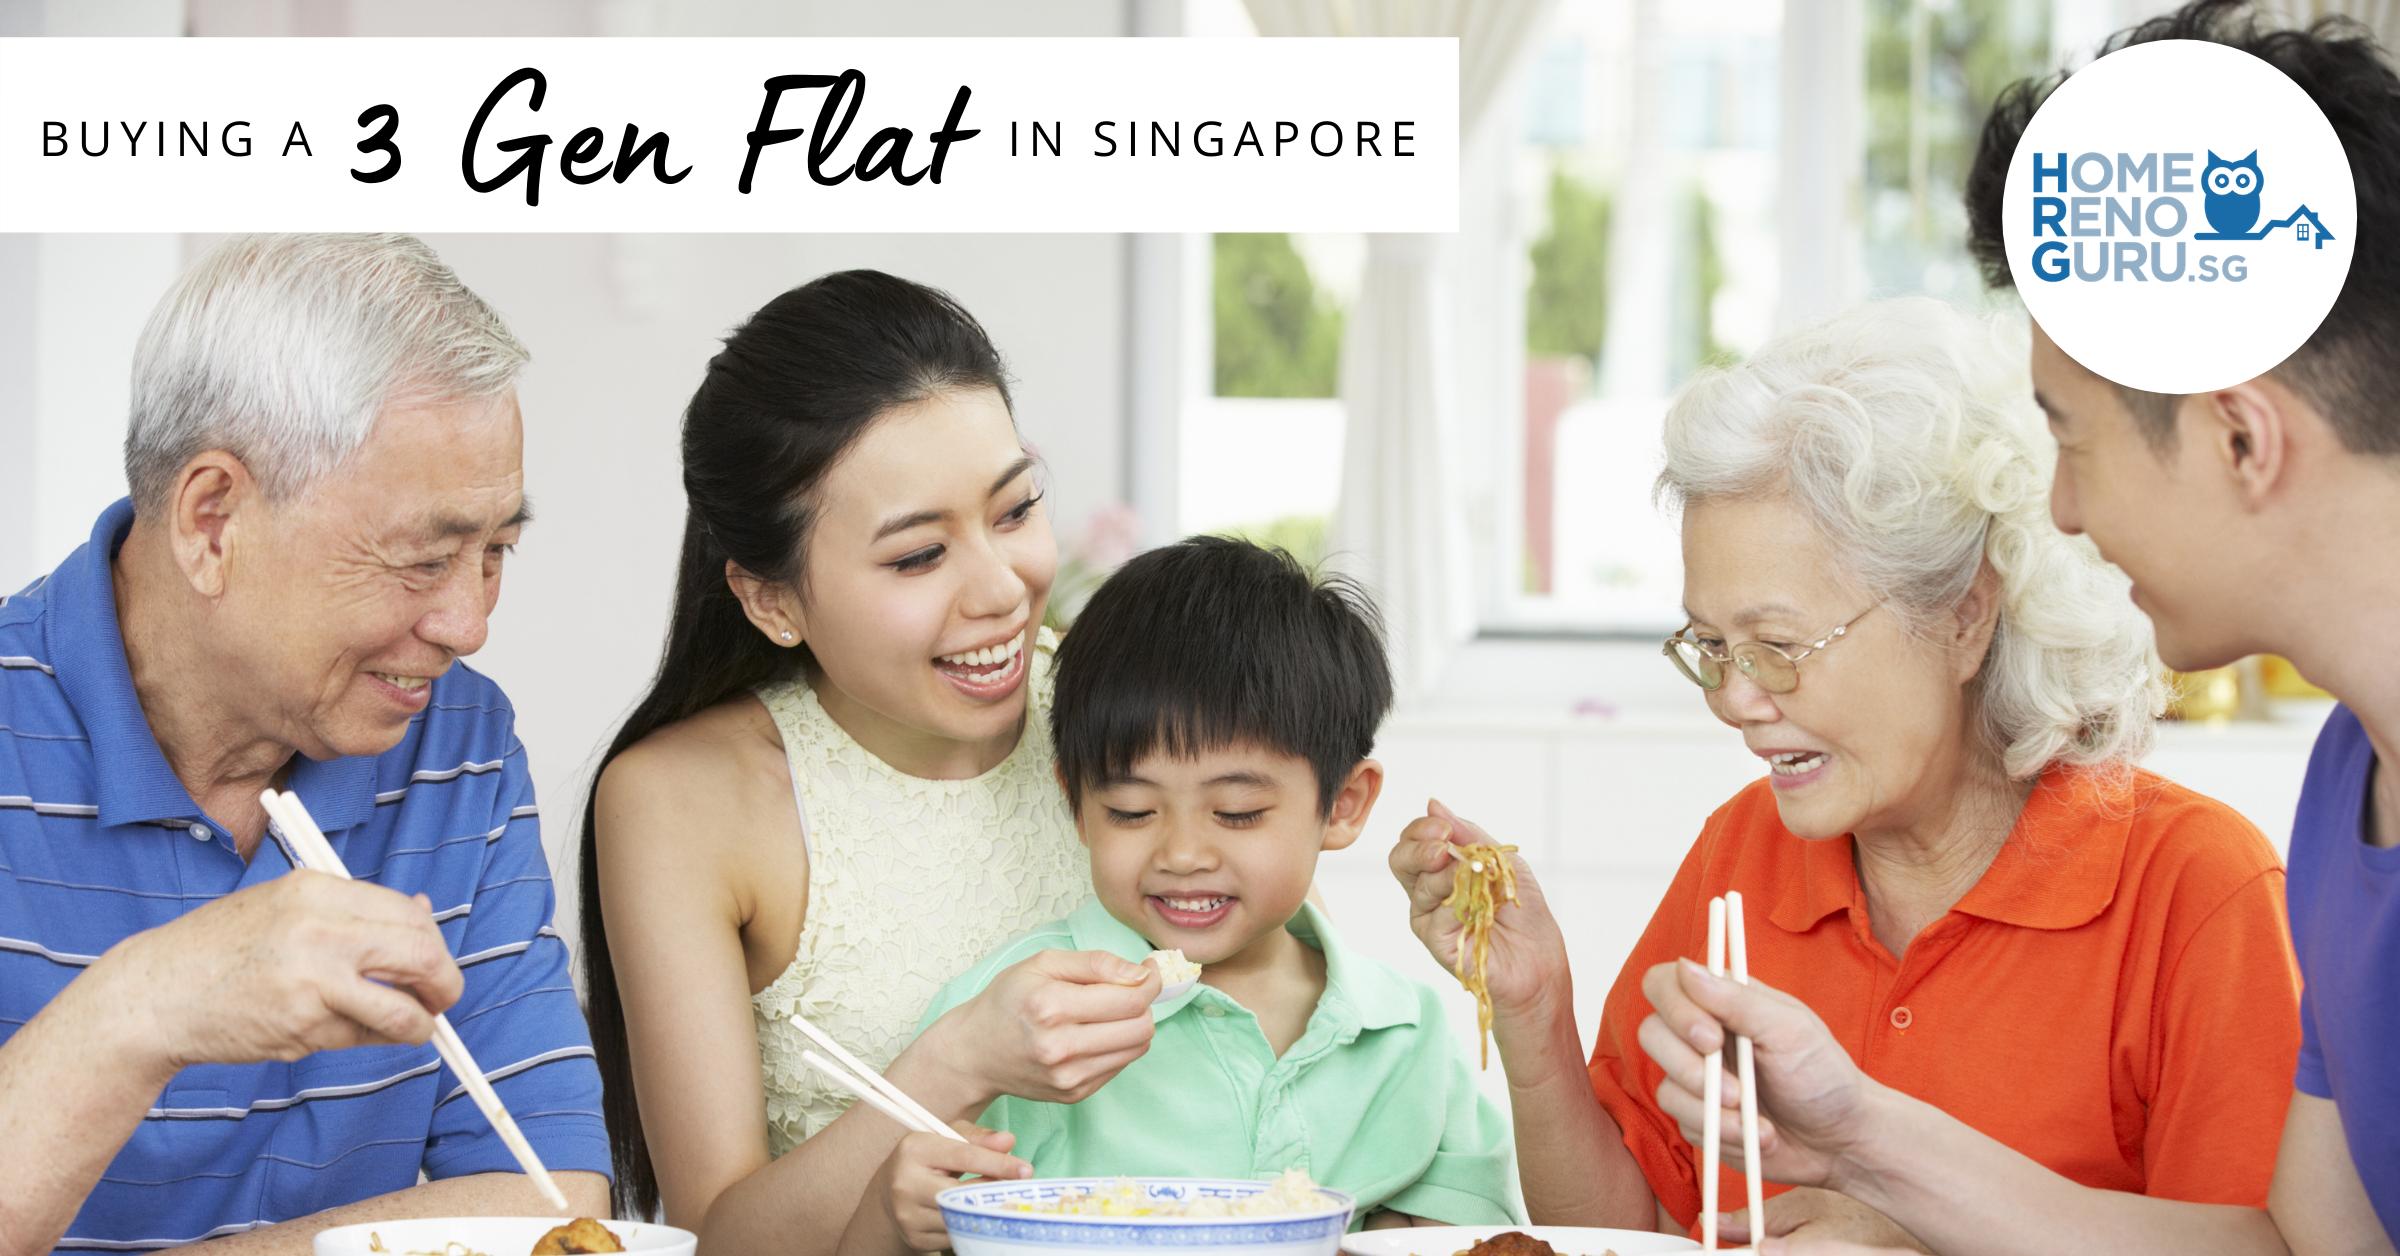 Multigenerational family eating dinner in a 3Gen flat